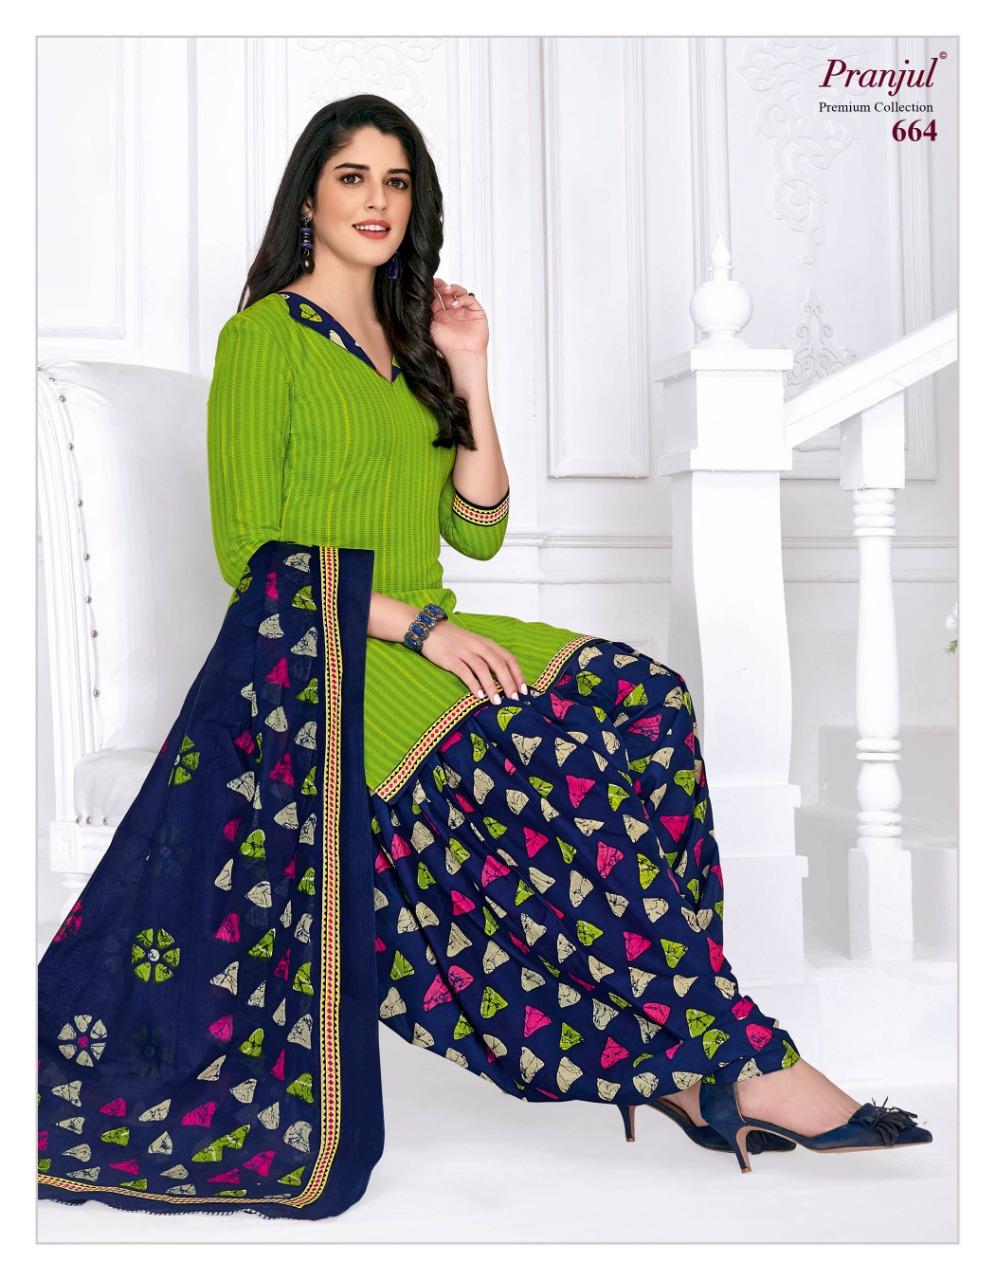 Pranjul Priyanka Vol 6 Premium Collection Readymade Suit Wholesale Catalog 15 Pcs 4 - Pranjul Priyanka Vol 6 Premium Collection Readymade Suit Wholesale Catalog 15 Pcs